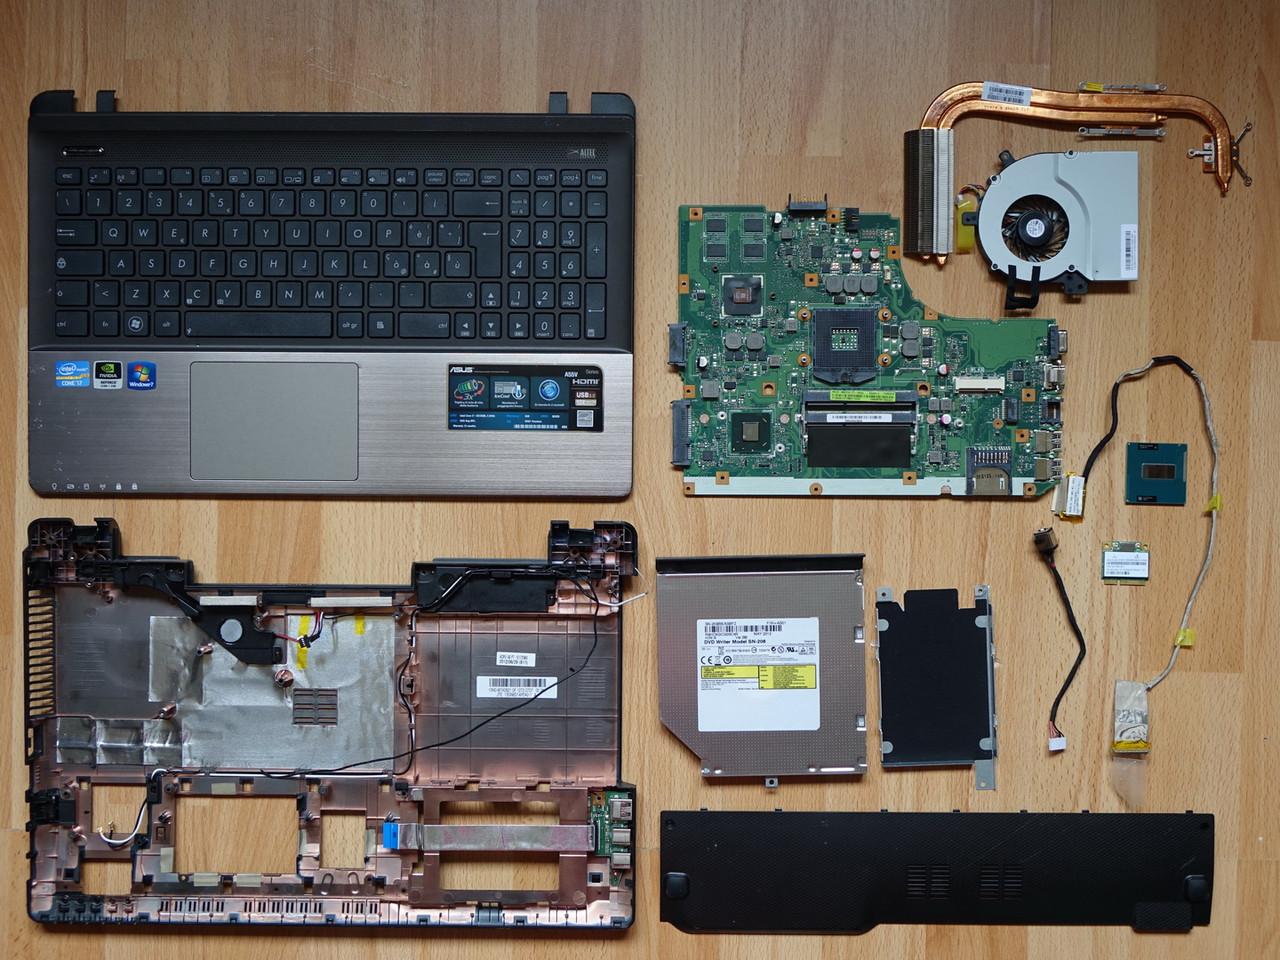 Разборка Asus A55V K55VD (Материнская плата, Процессор i7, Поддон, Топкейс, Клавиатура, WiFi, Динамик, Шлейф )